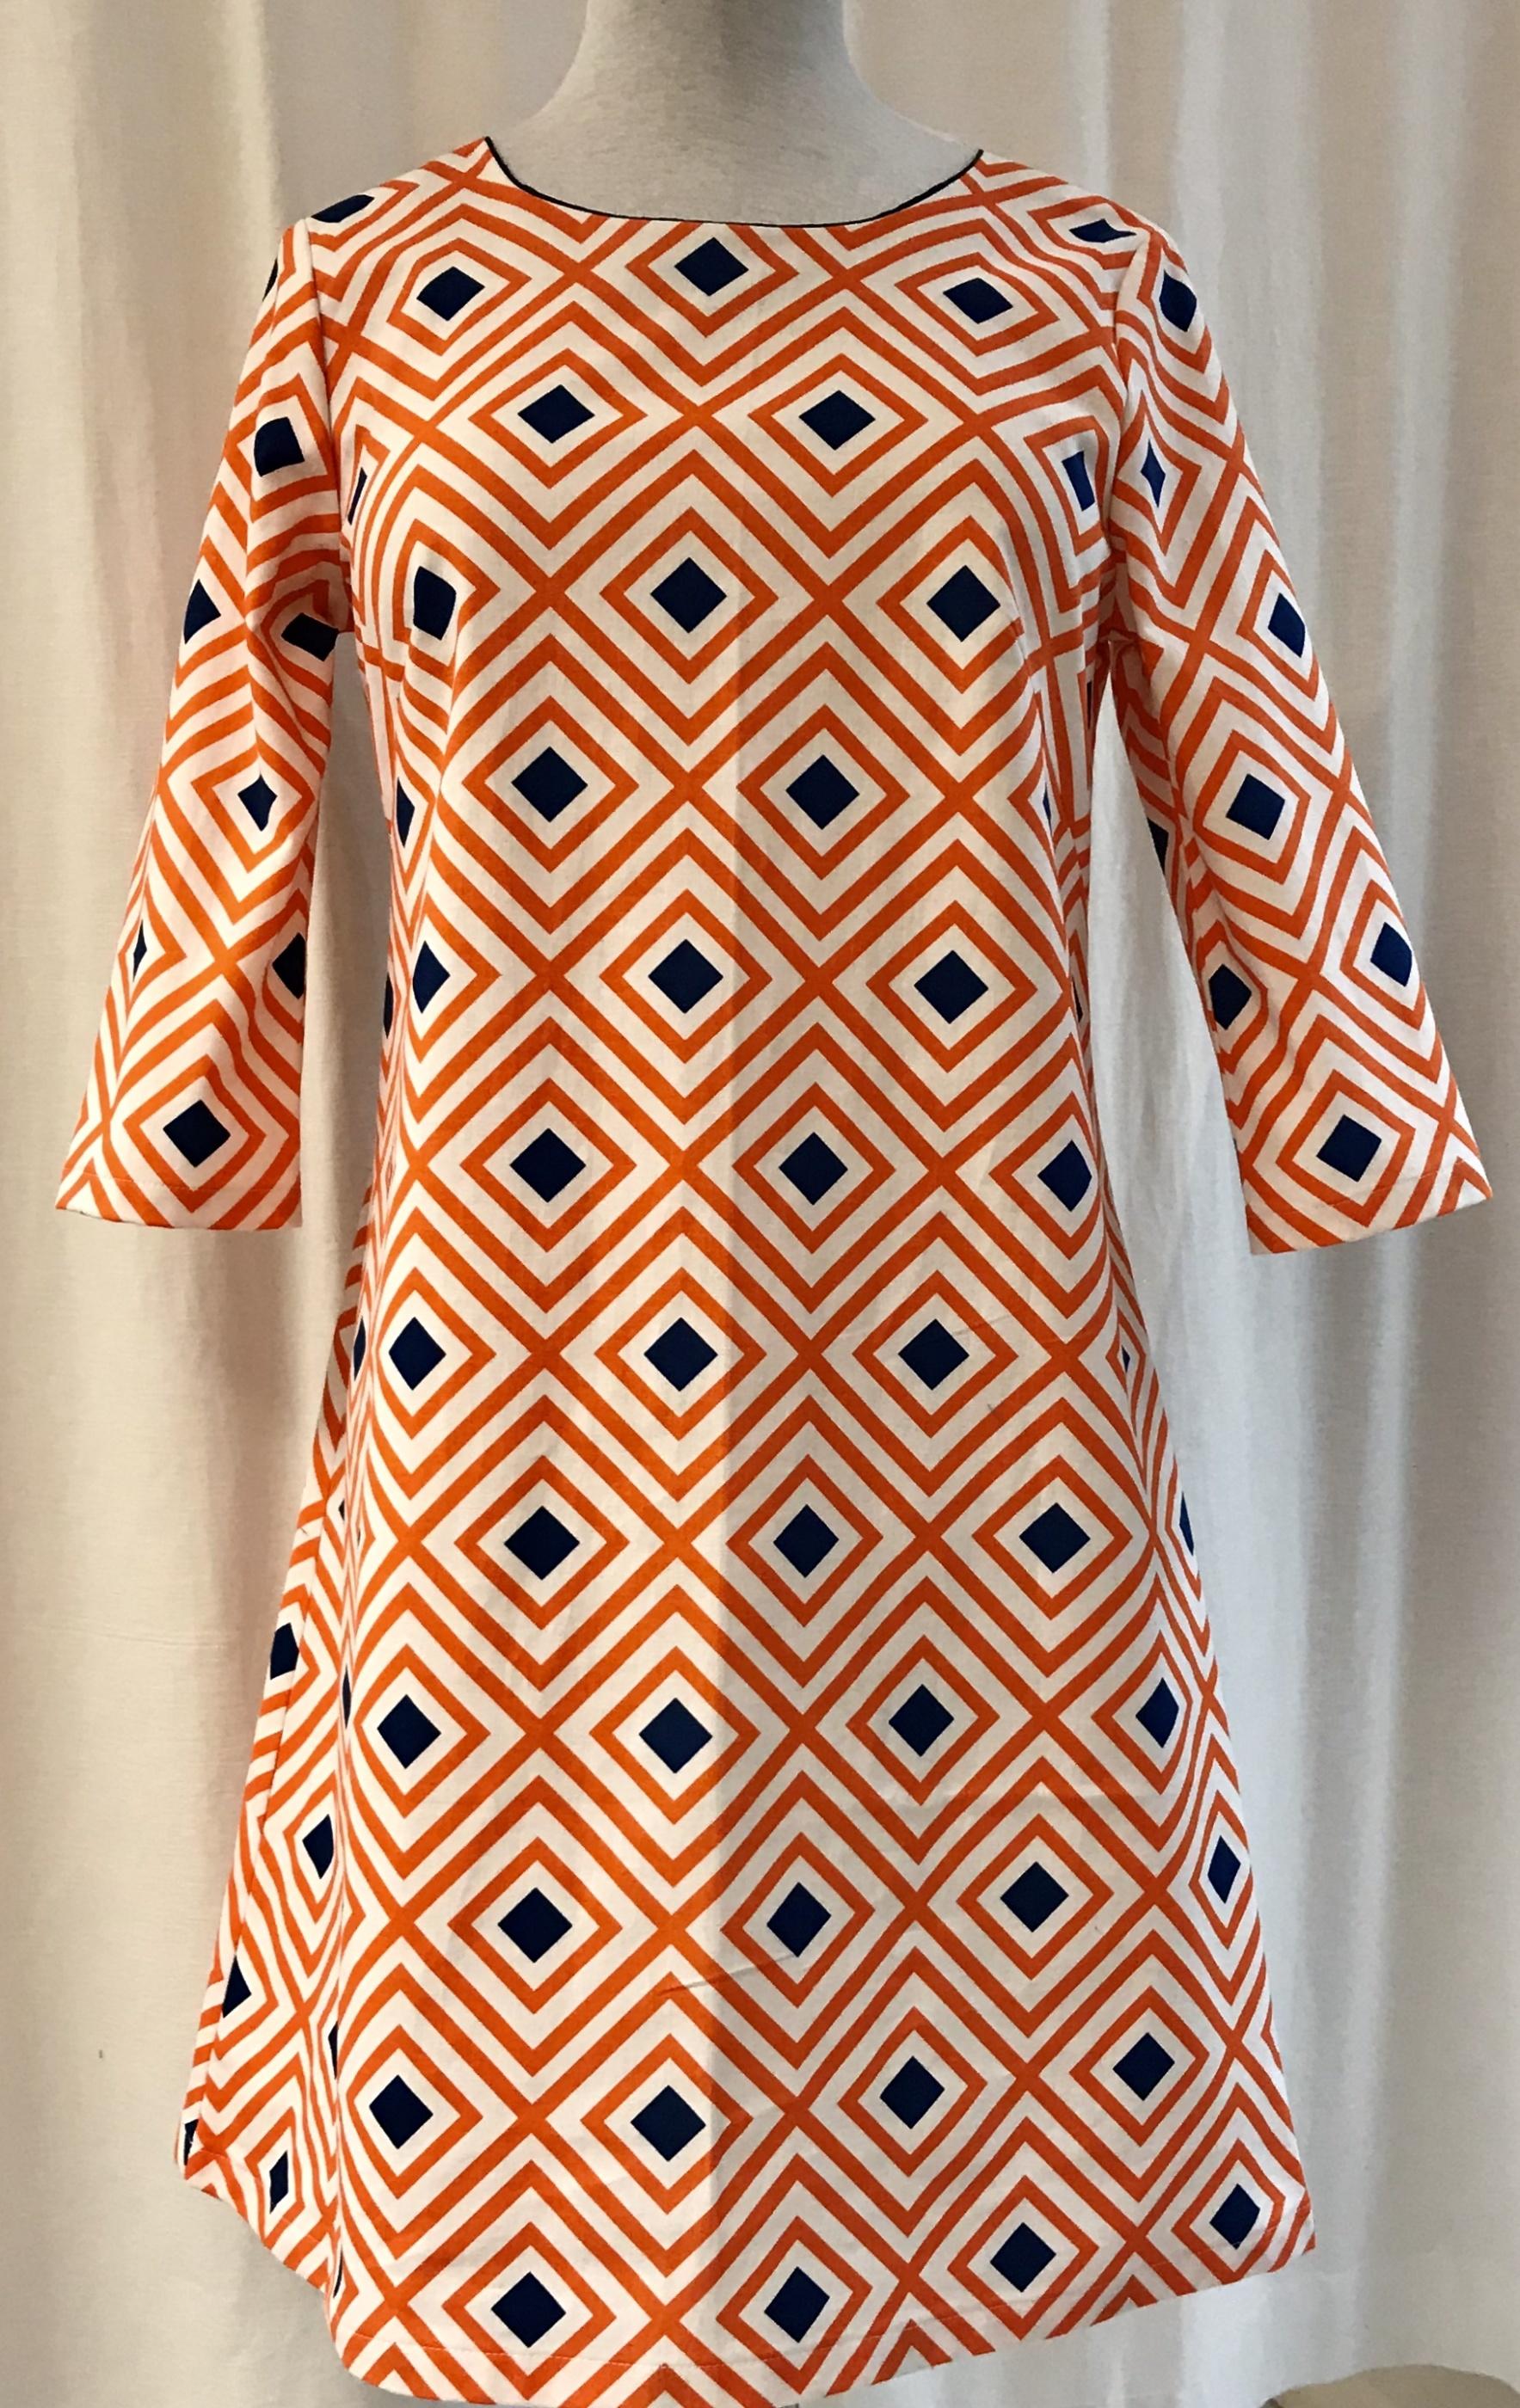 klänning solbritt SaraLaholm orange rosett gåsöga unik